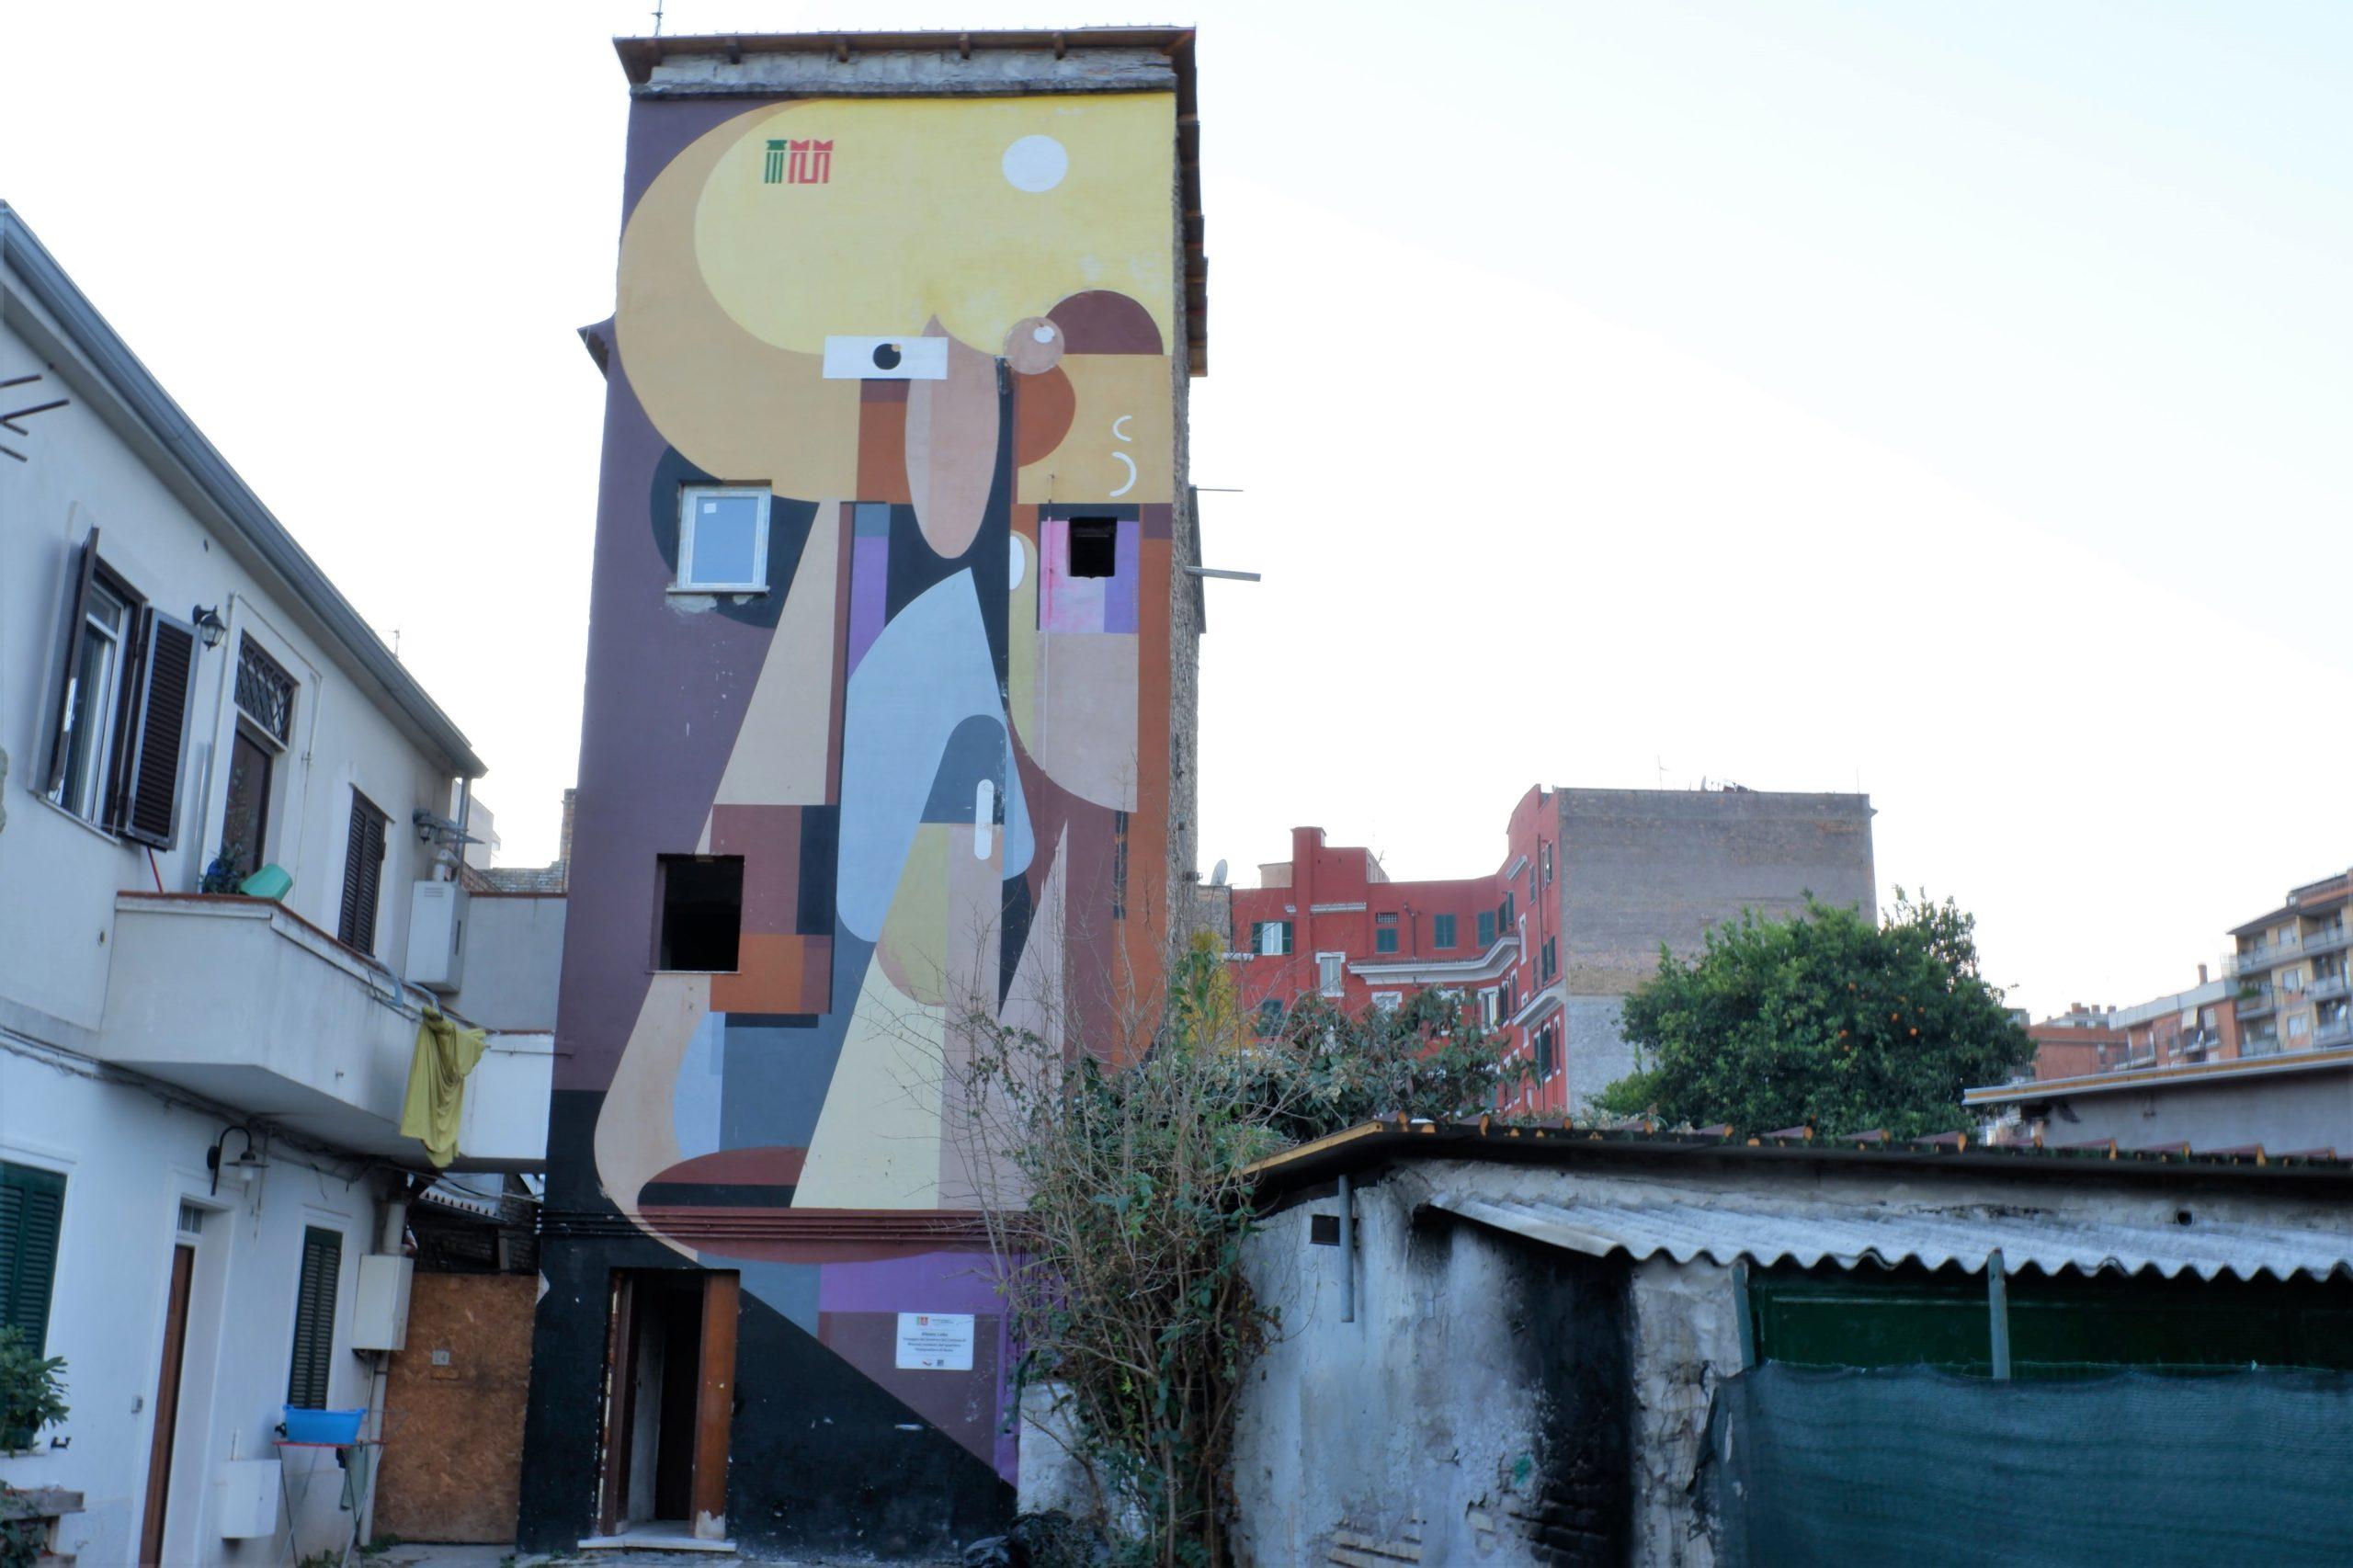 alexey luka murales tor pignattara roma